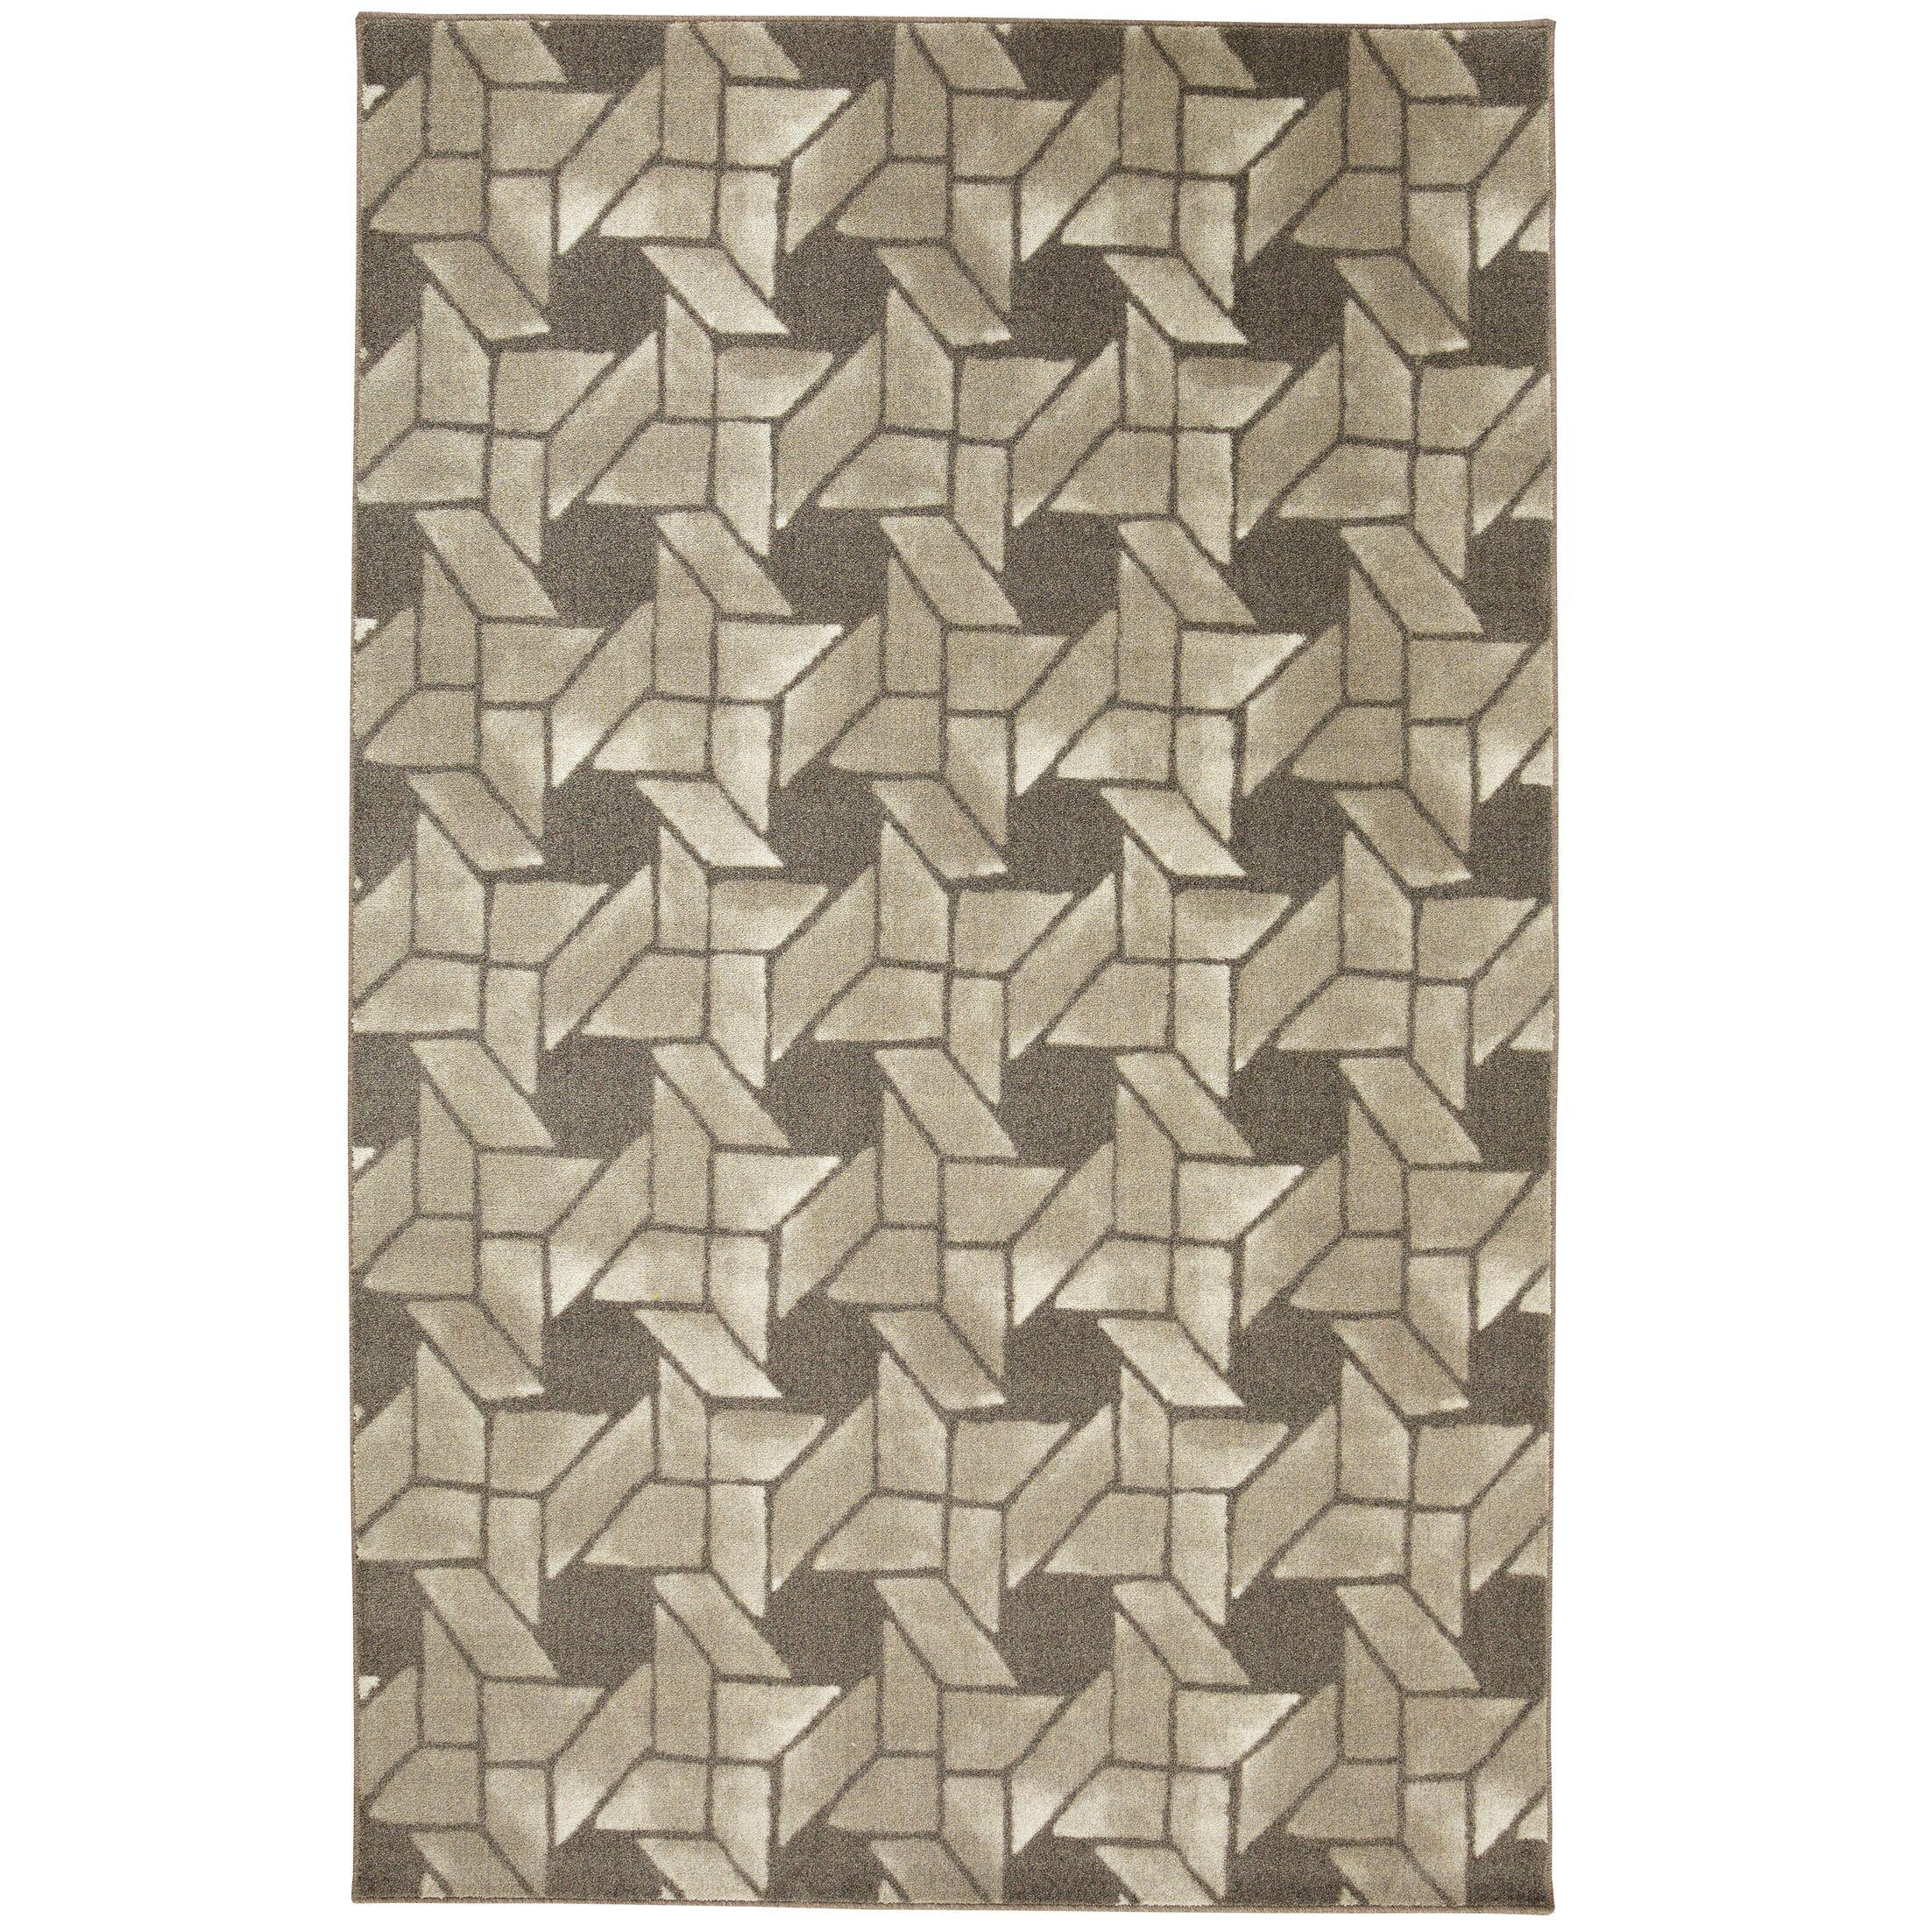 Kerber Linked Geo Gray Area Rug Rug Size: Rectangle 8' x 10'